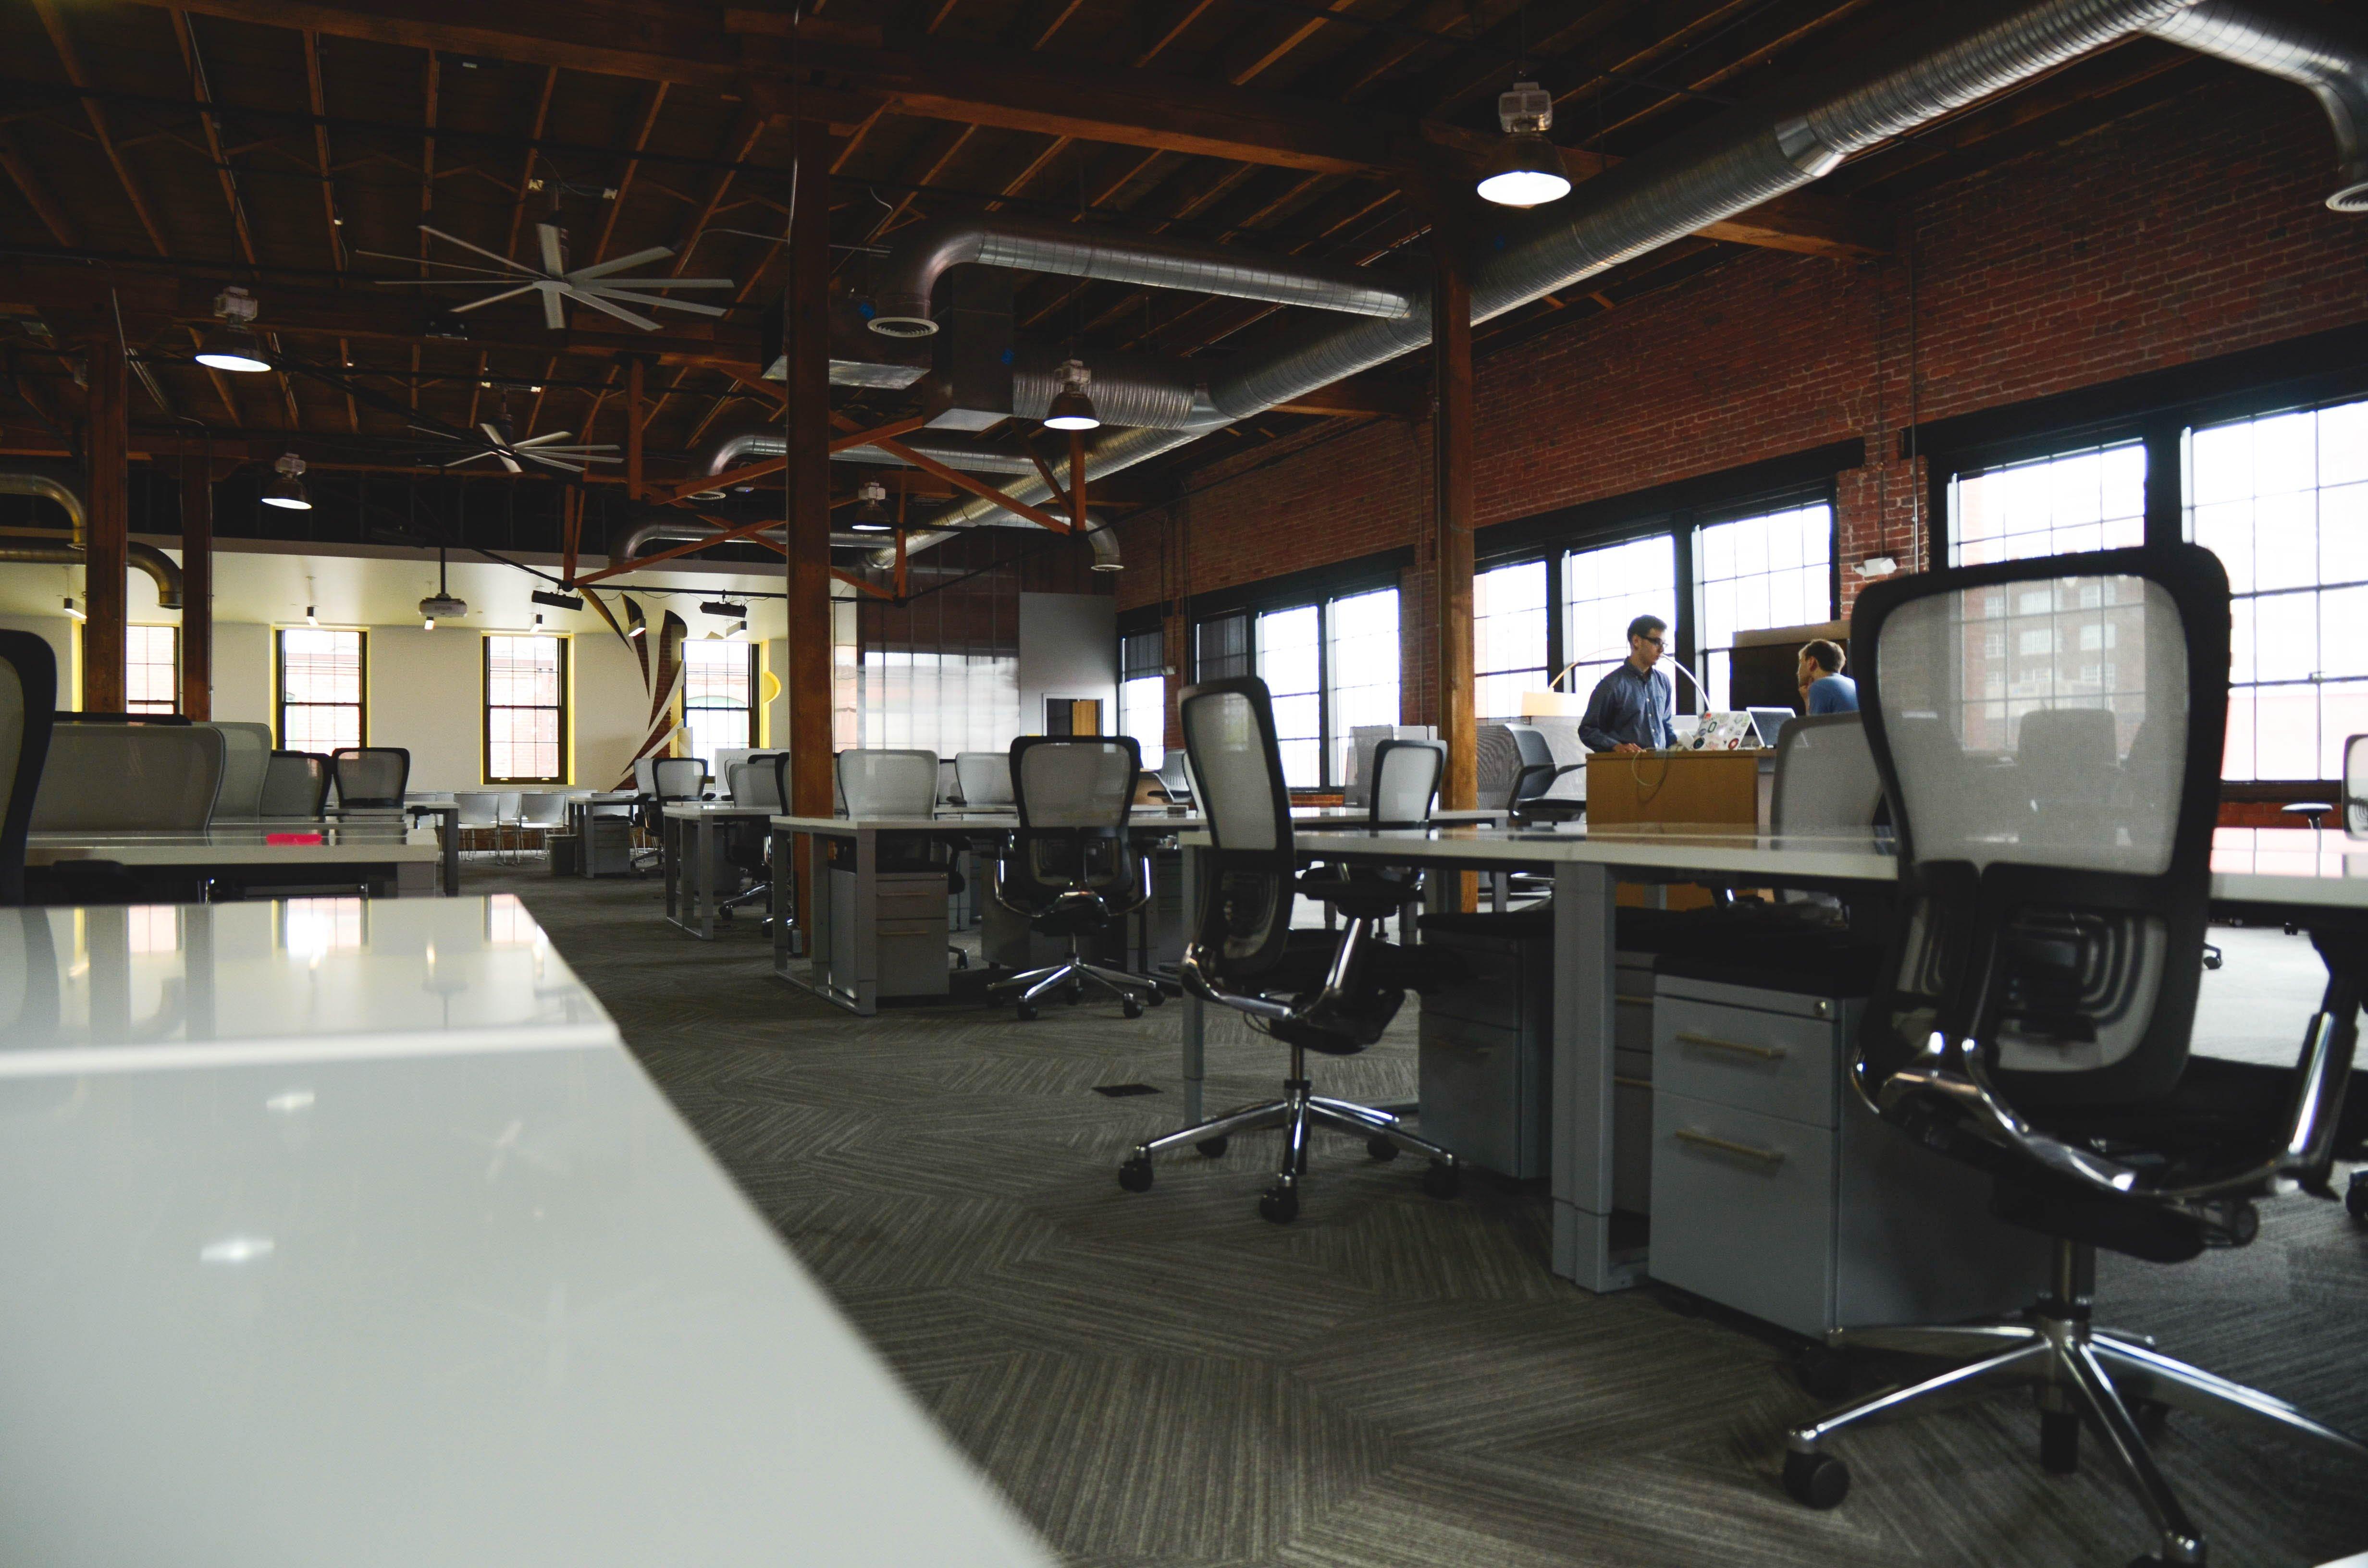 Travaillez votre employee retention